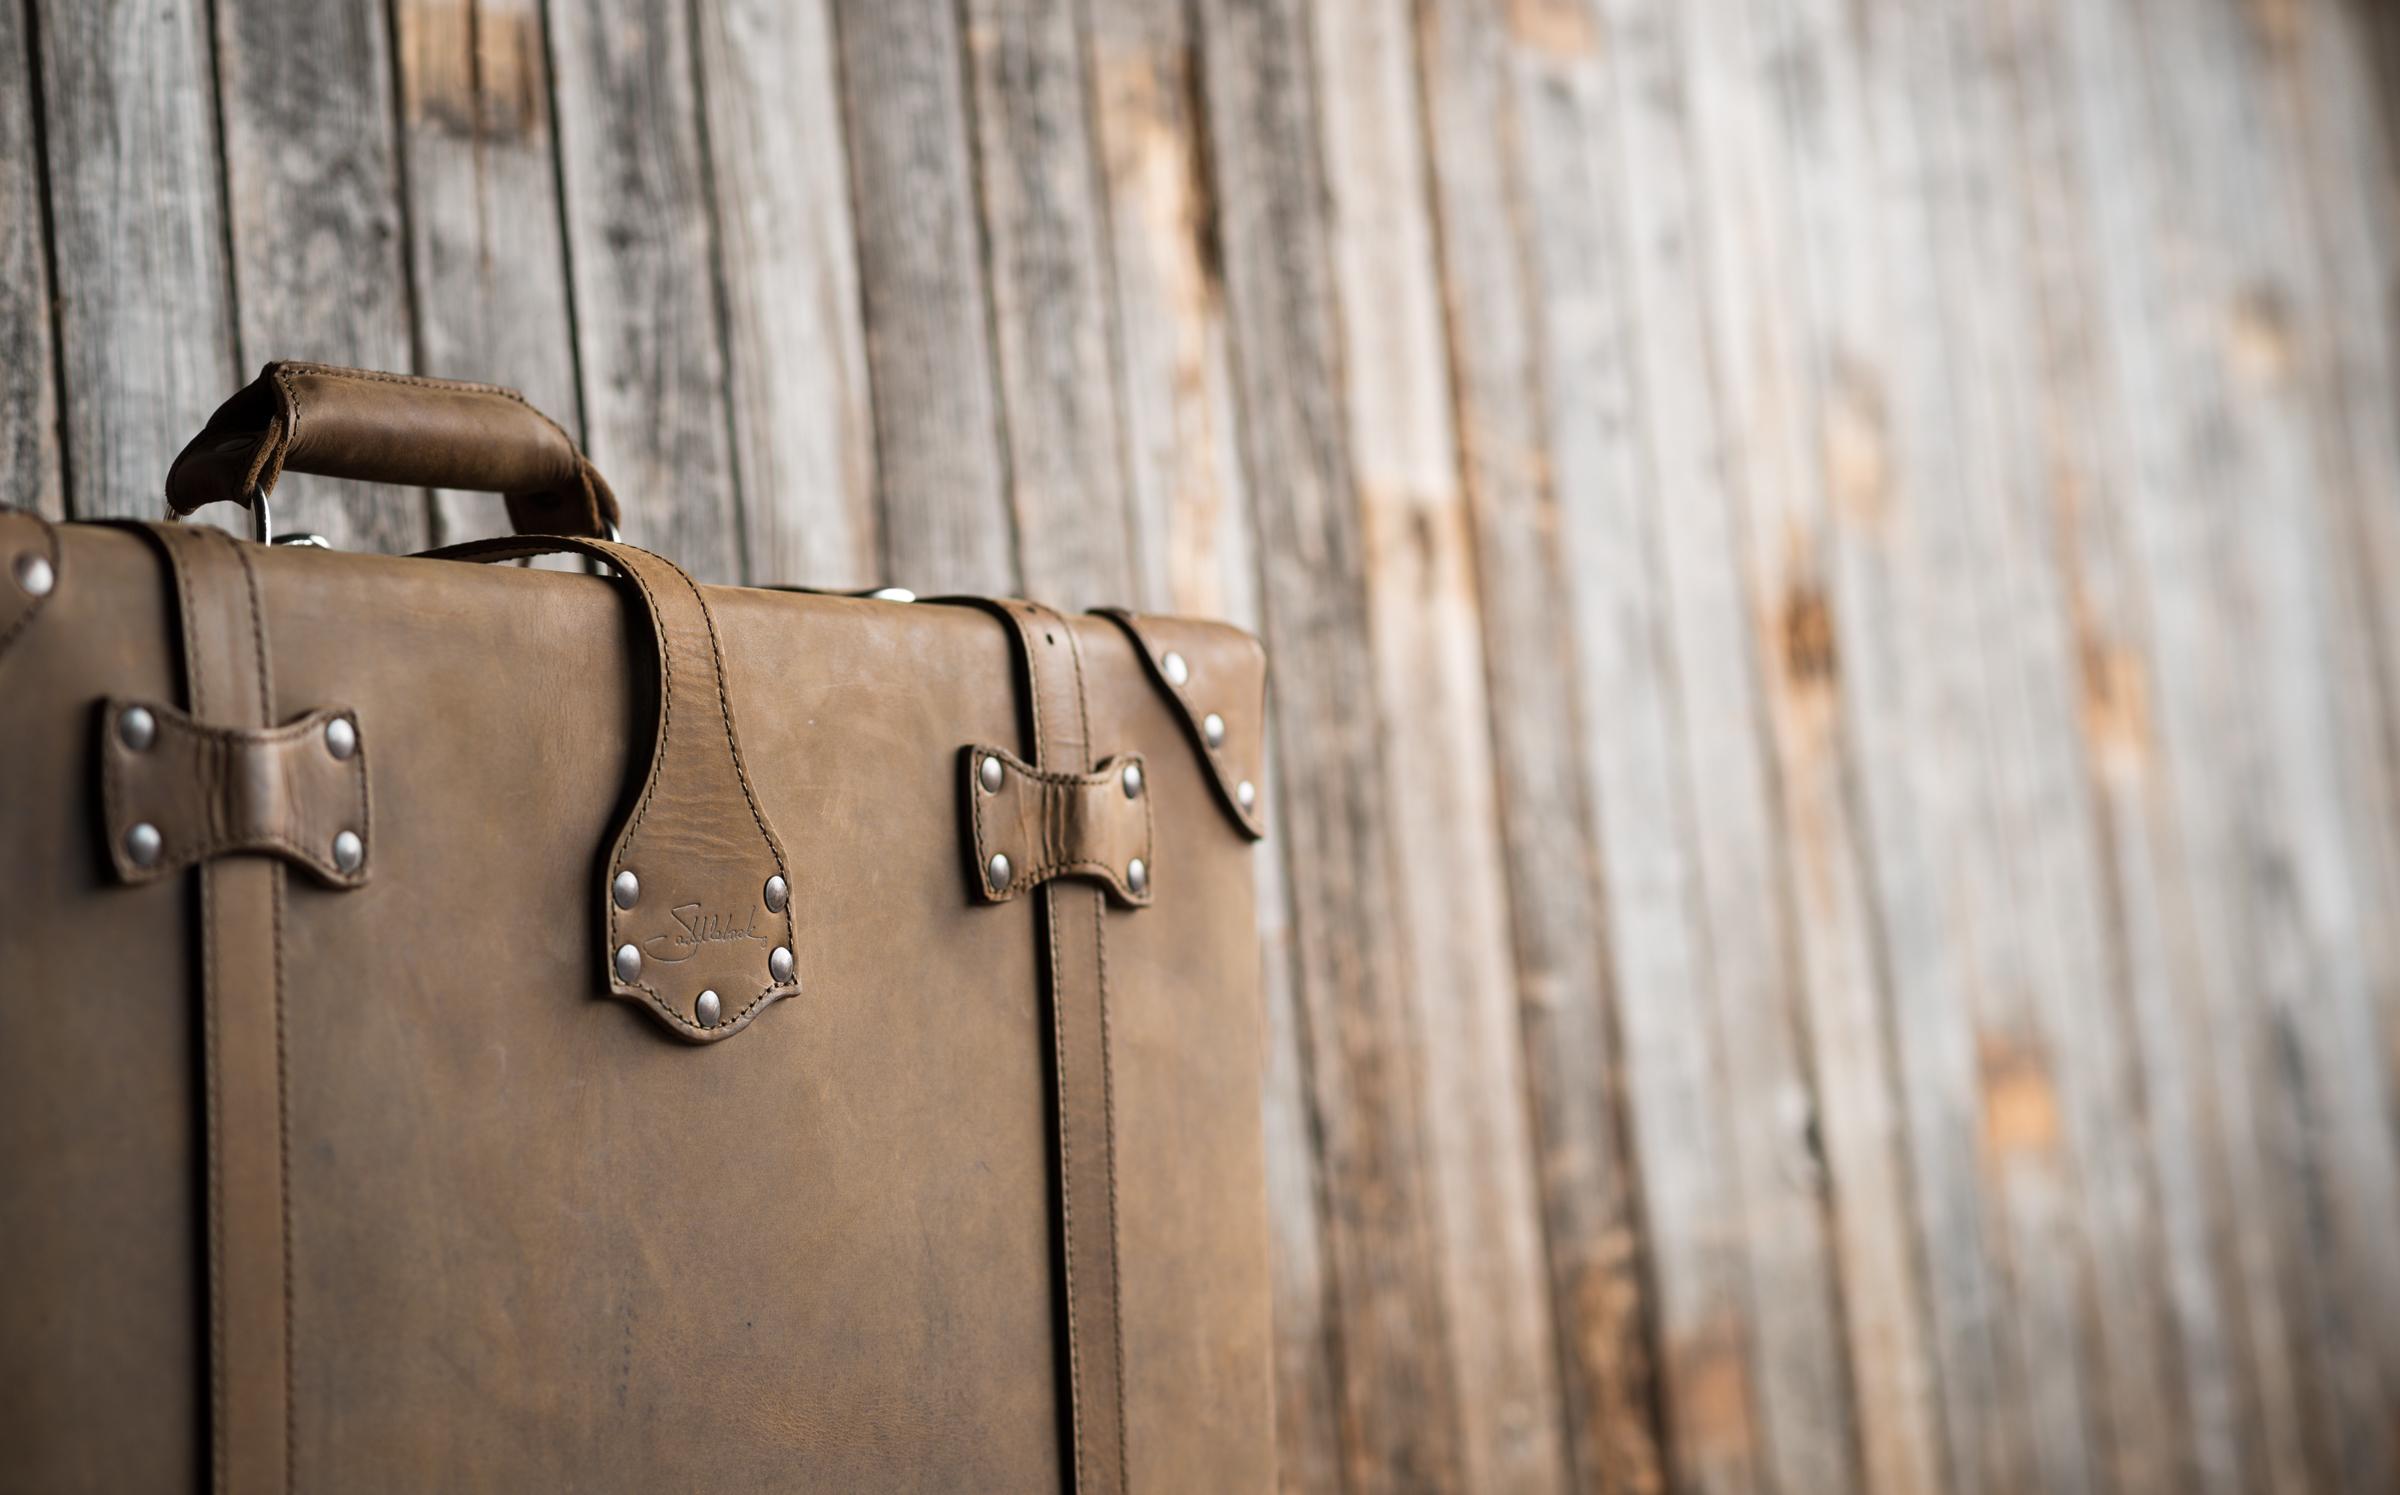 suitcase-tobacco-01.jpg